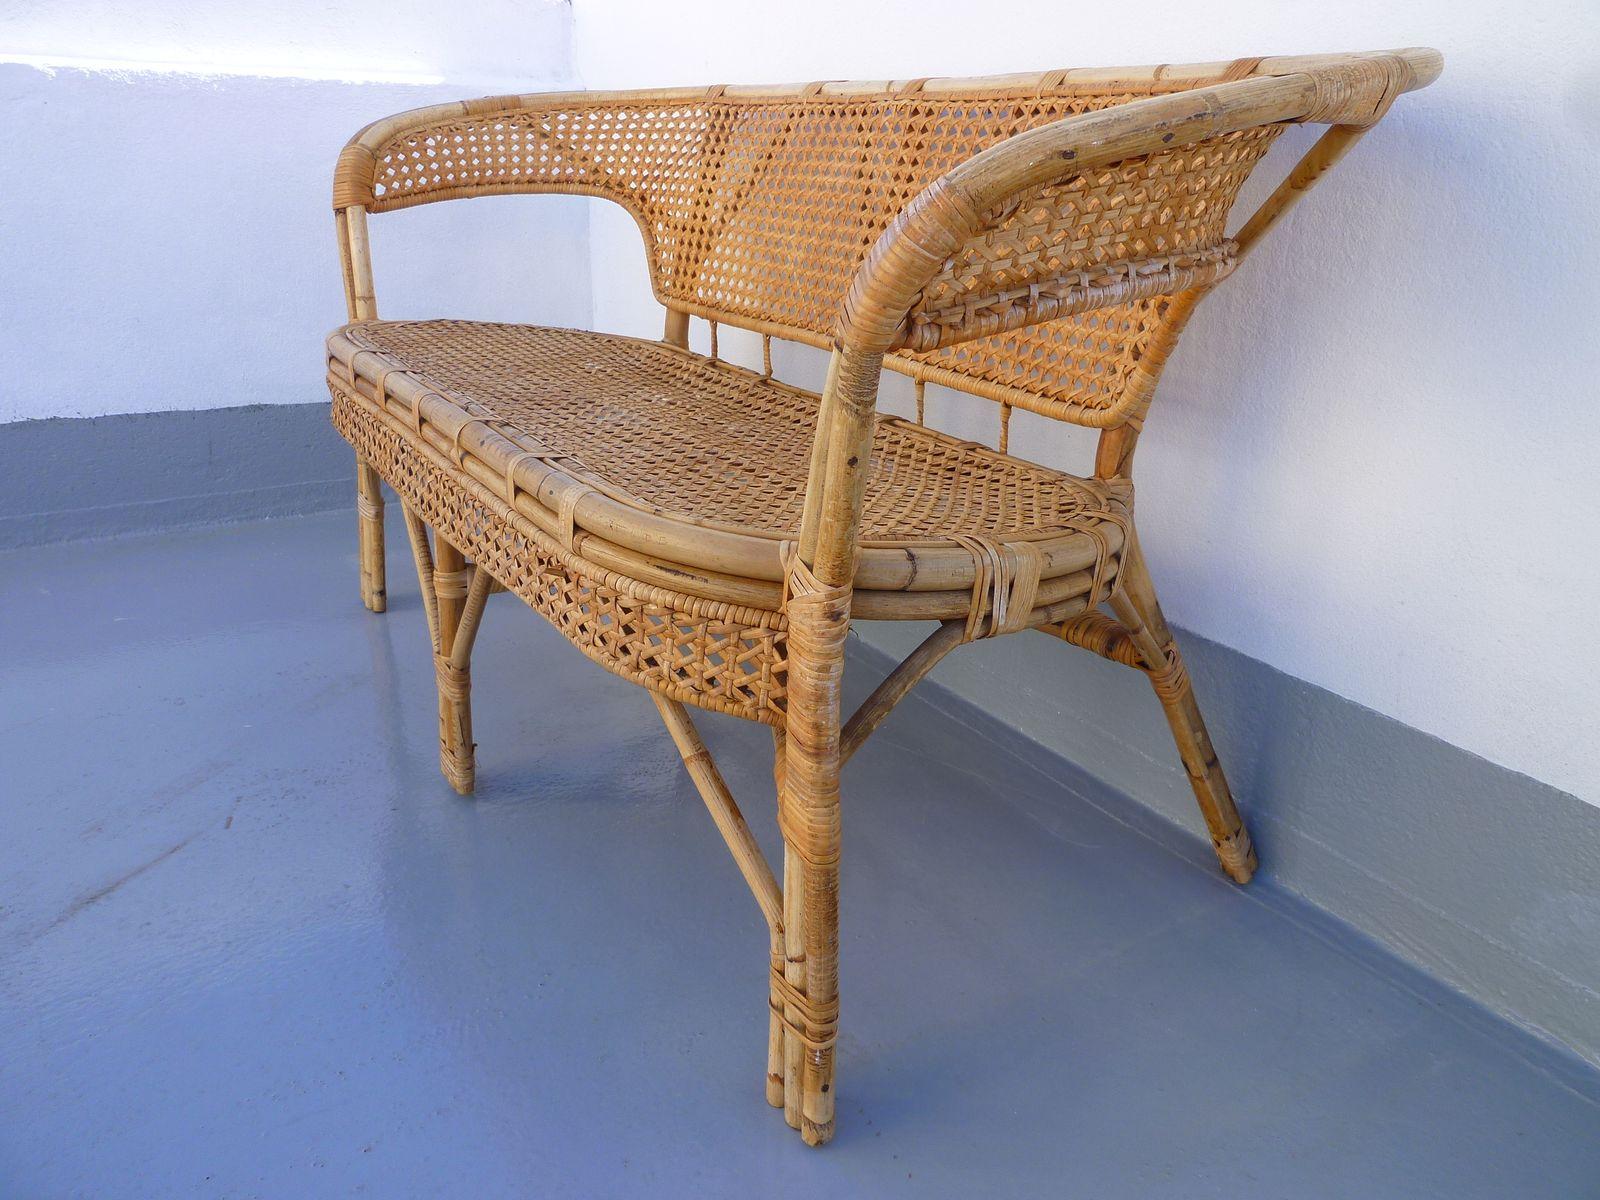 banc vintage en jonc et rotin en vente sur pamono. Black Bedroom Furniture Sets. Home Design Ideas